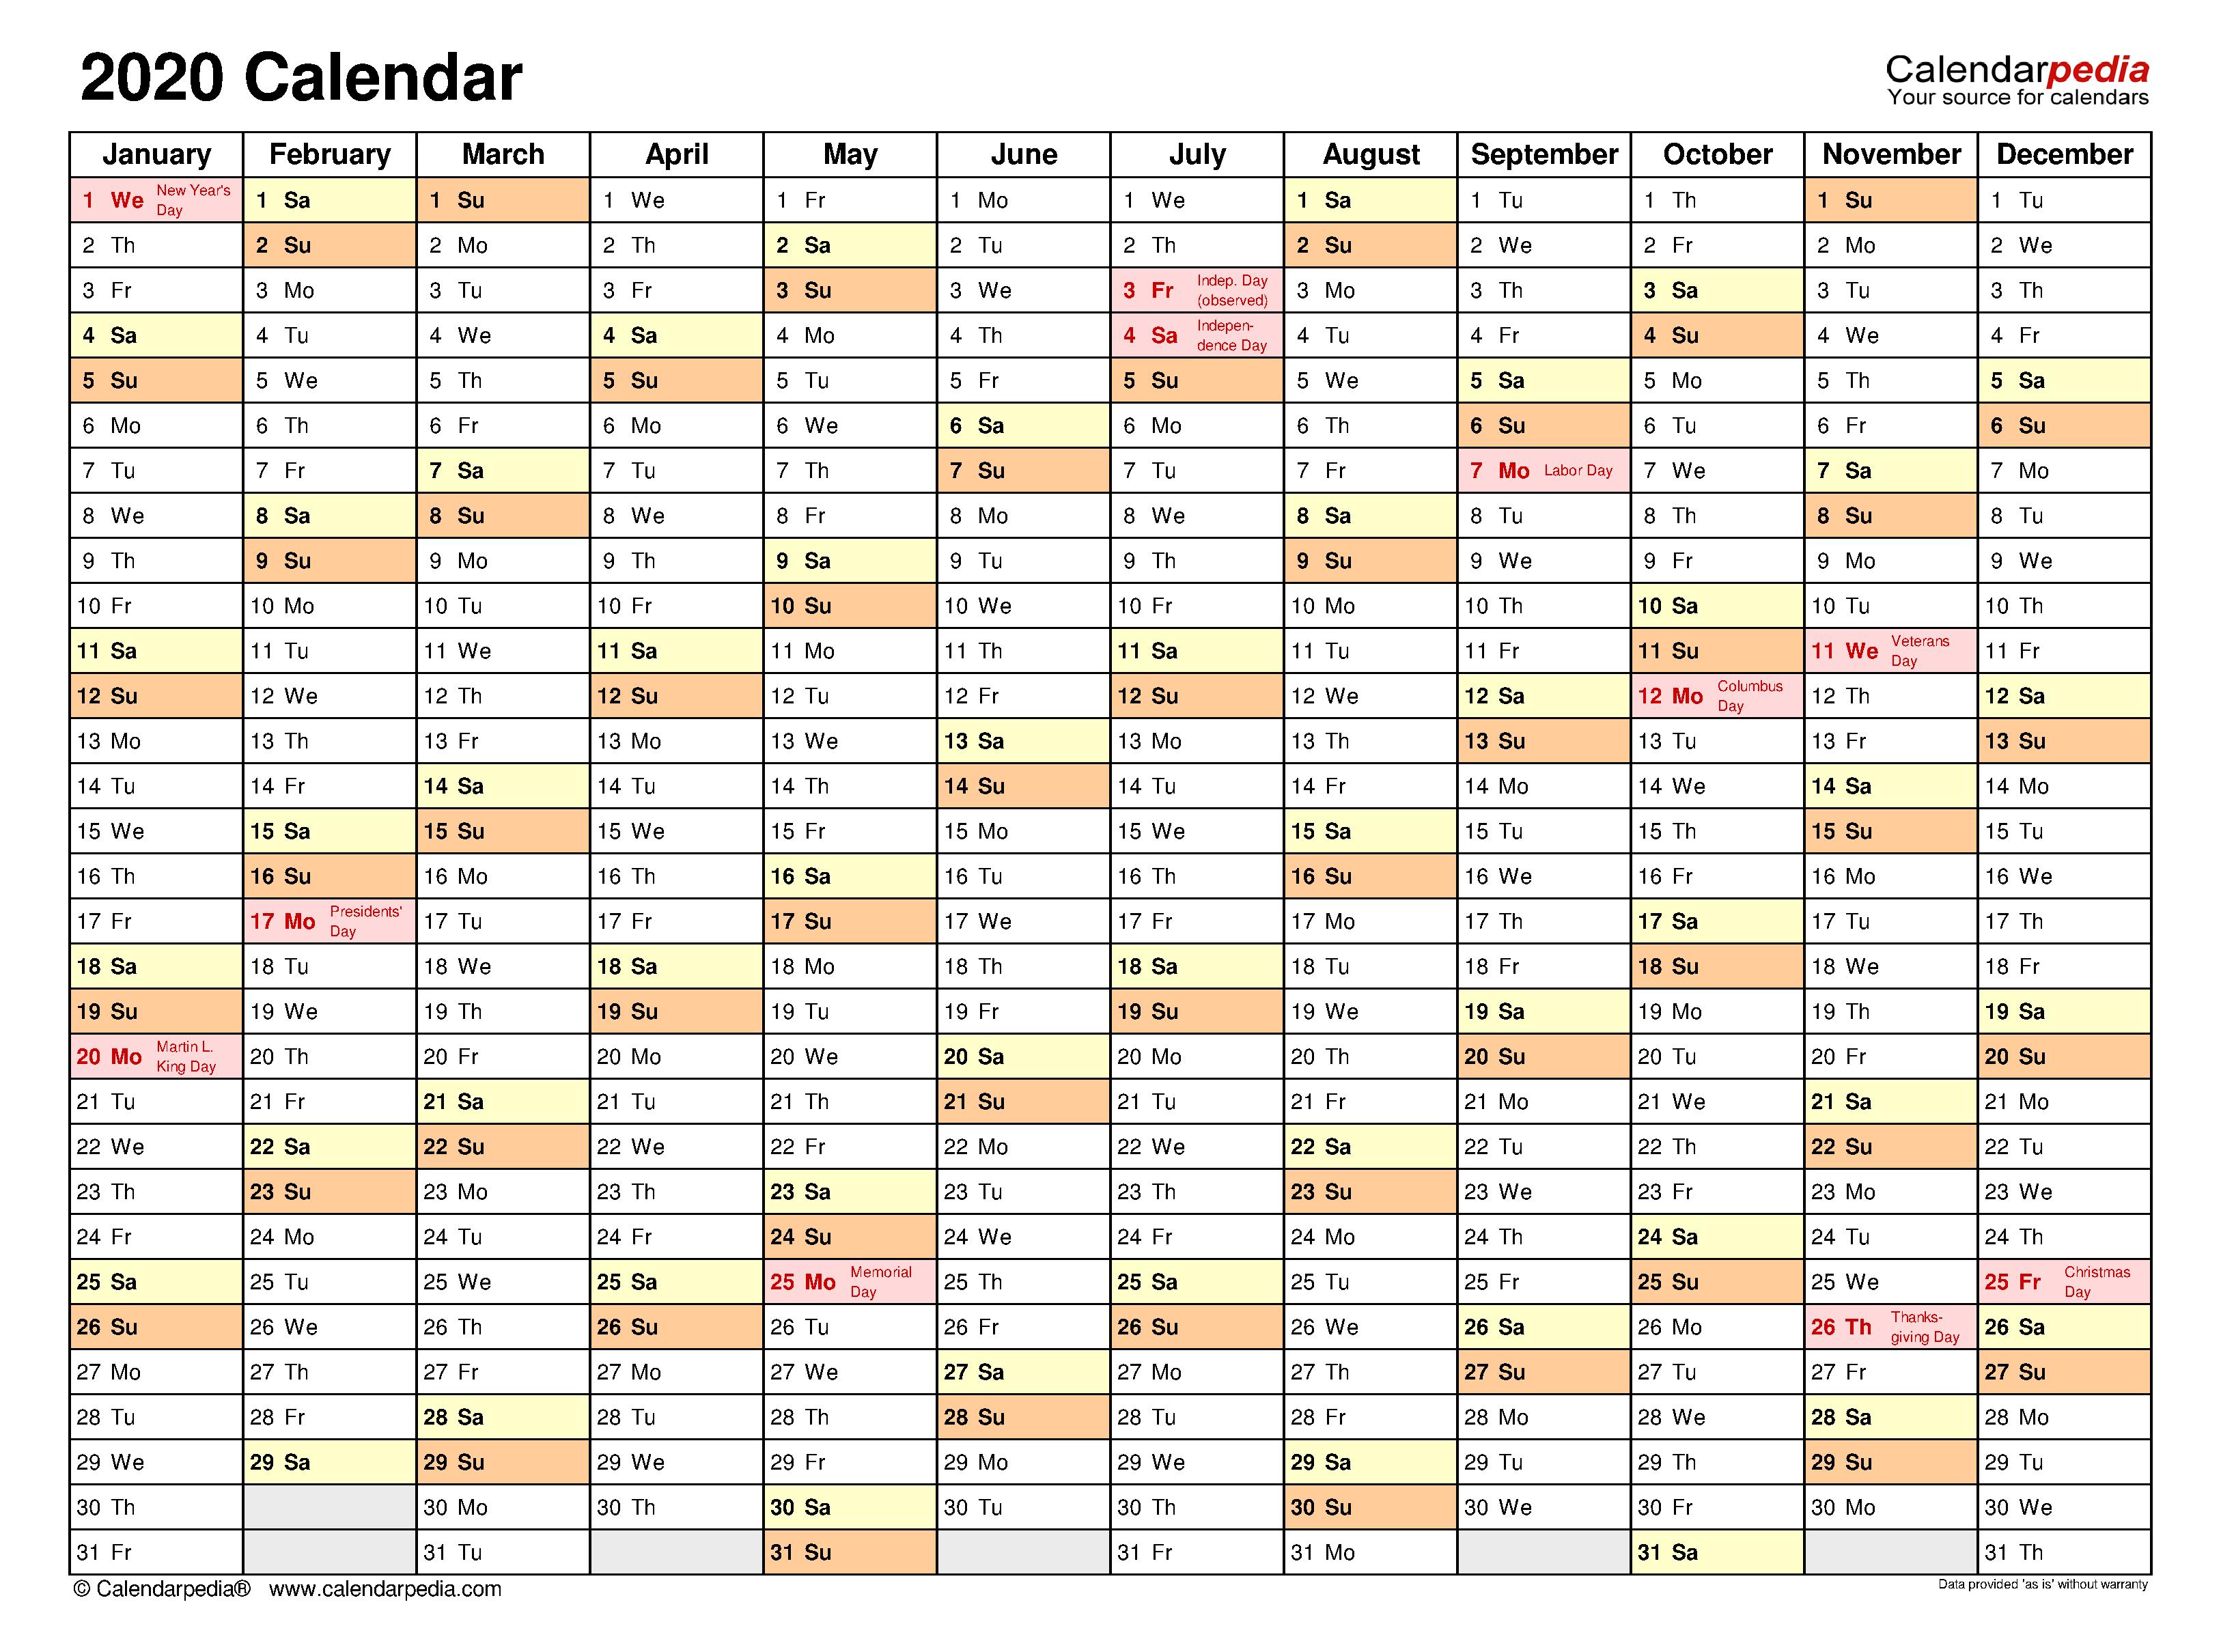 Planner Calendar Template from www.calendarpedia.com